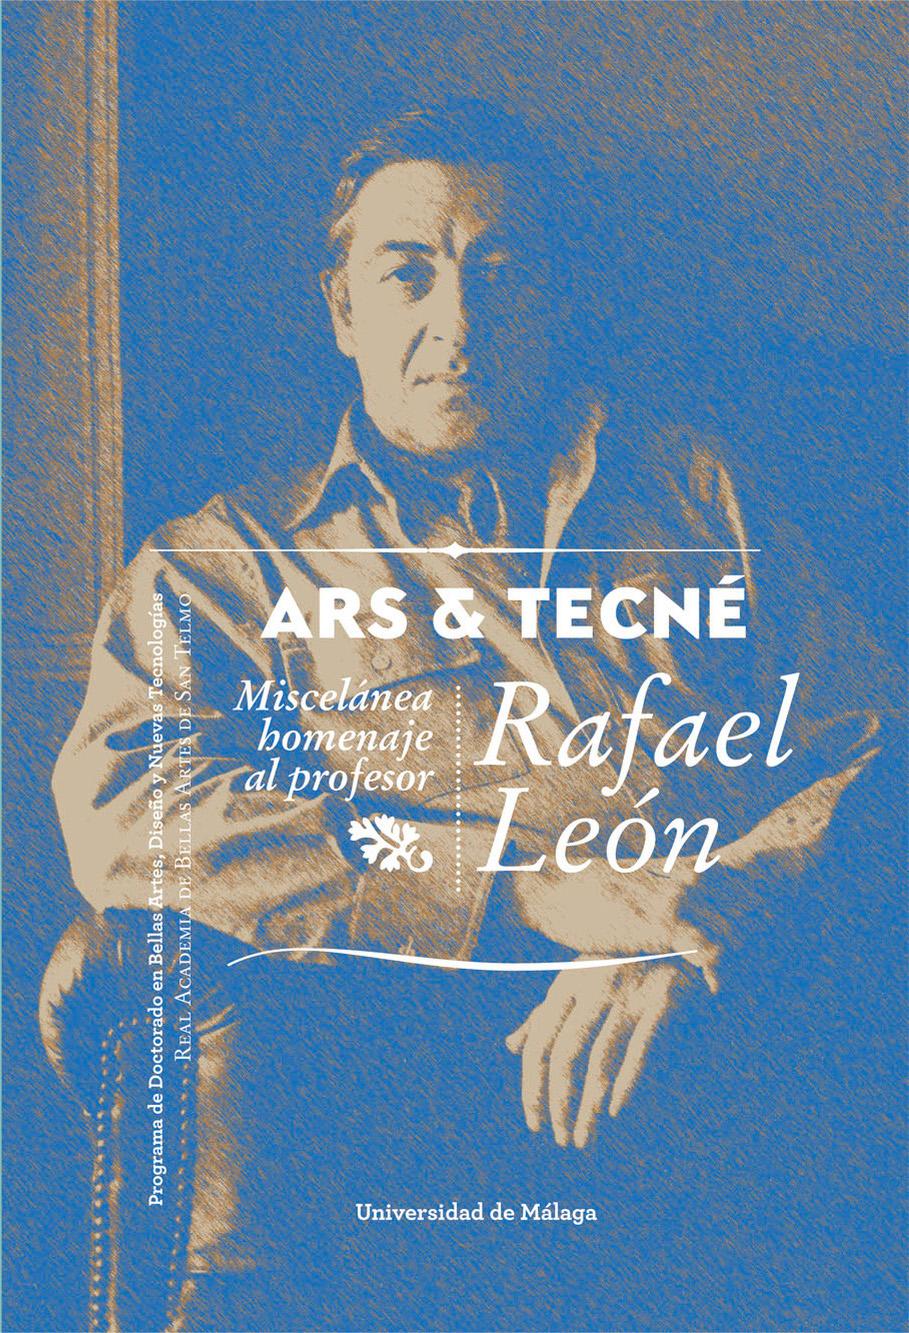 ARS & TECNÉ. Miscelánea homenaje al profesor Rafael León